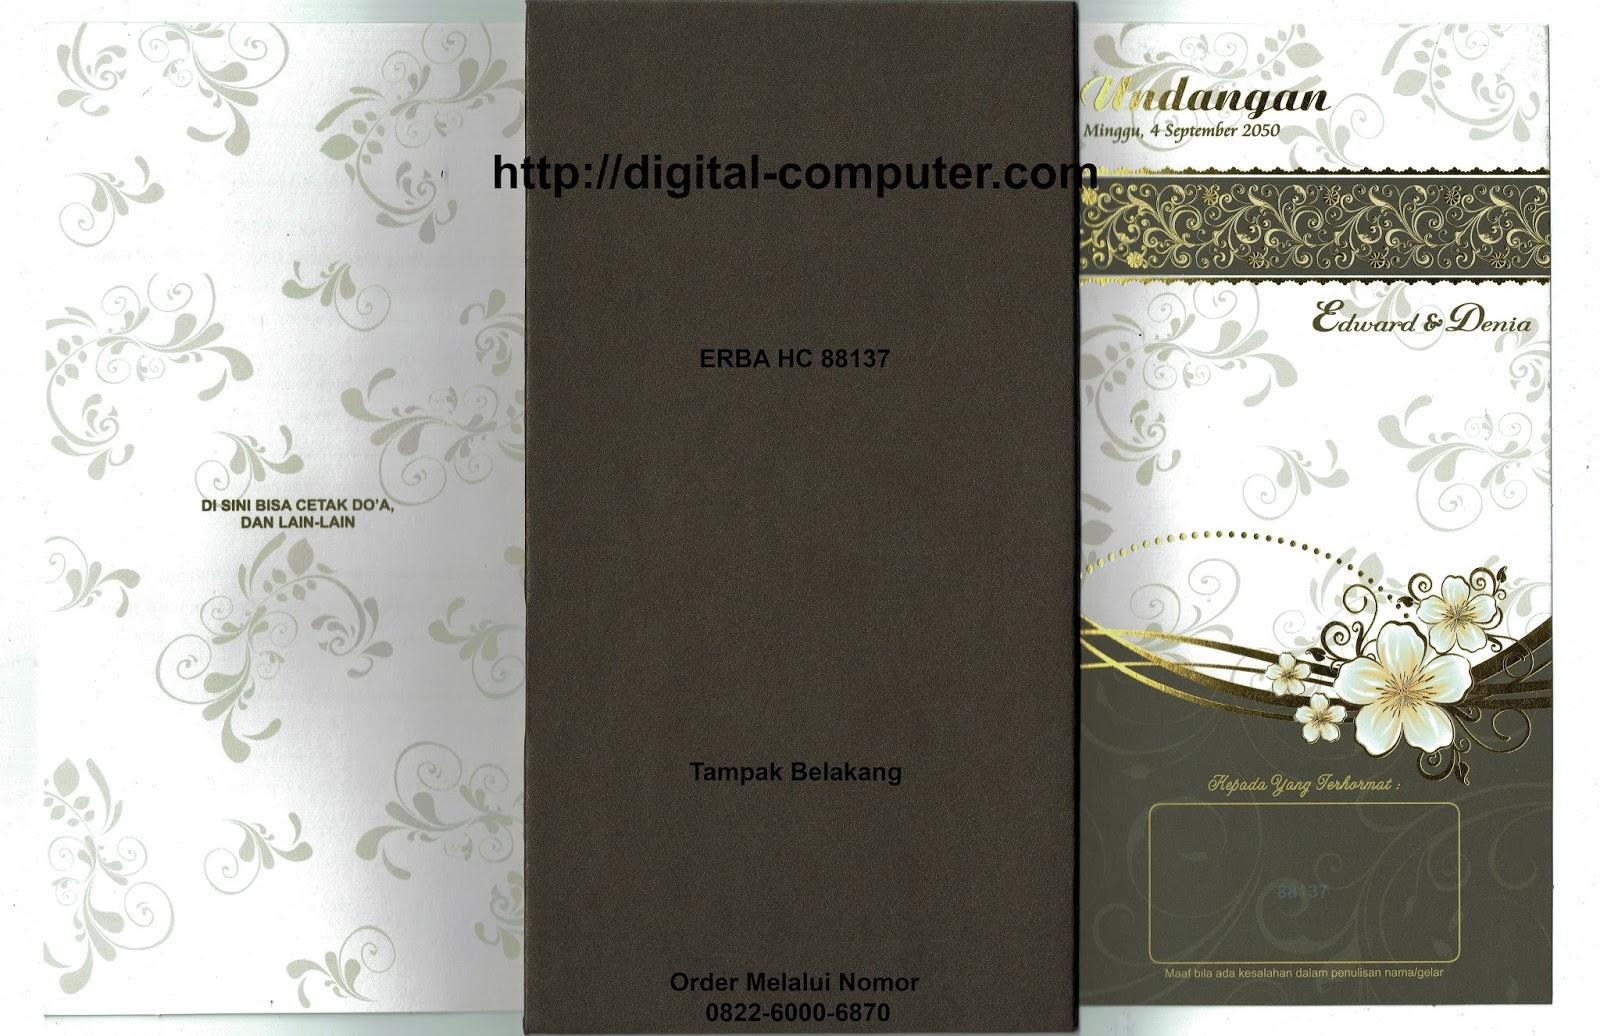 undangan hardcover ERBA HC-88137